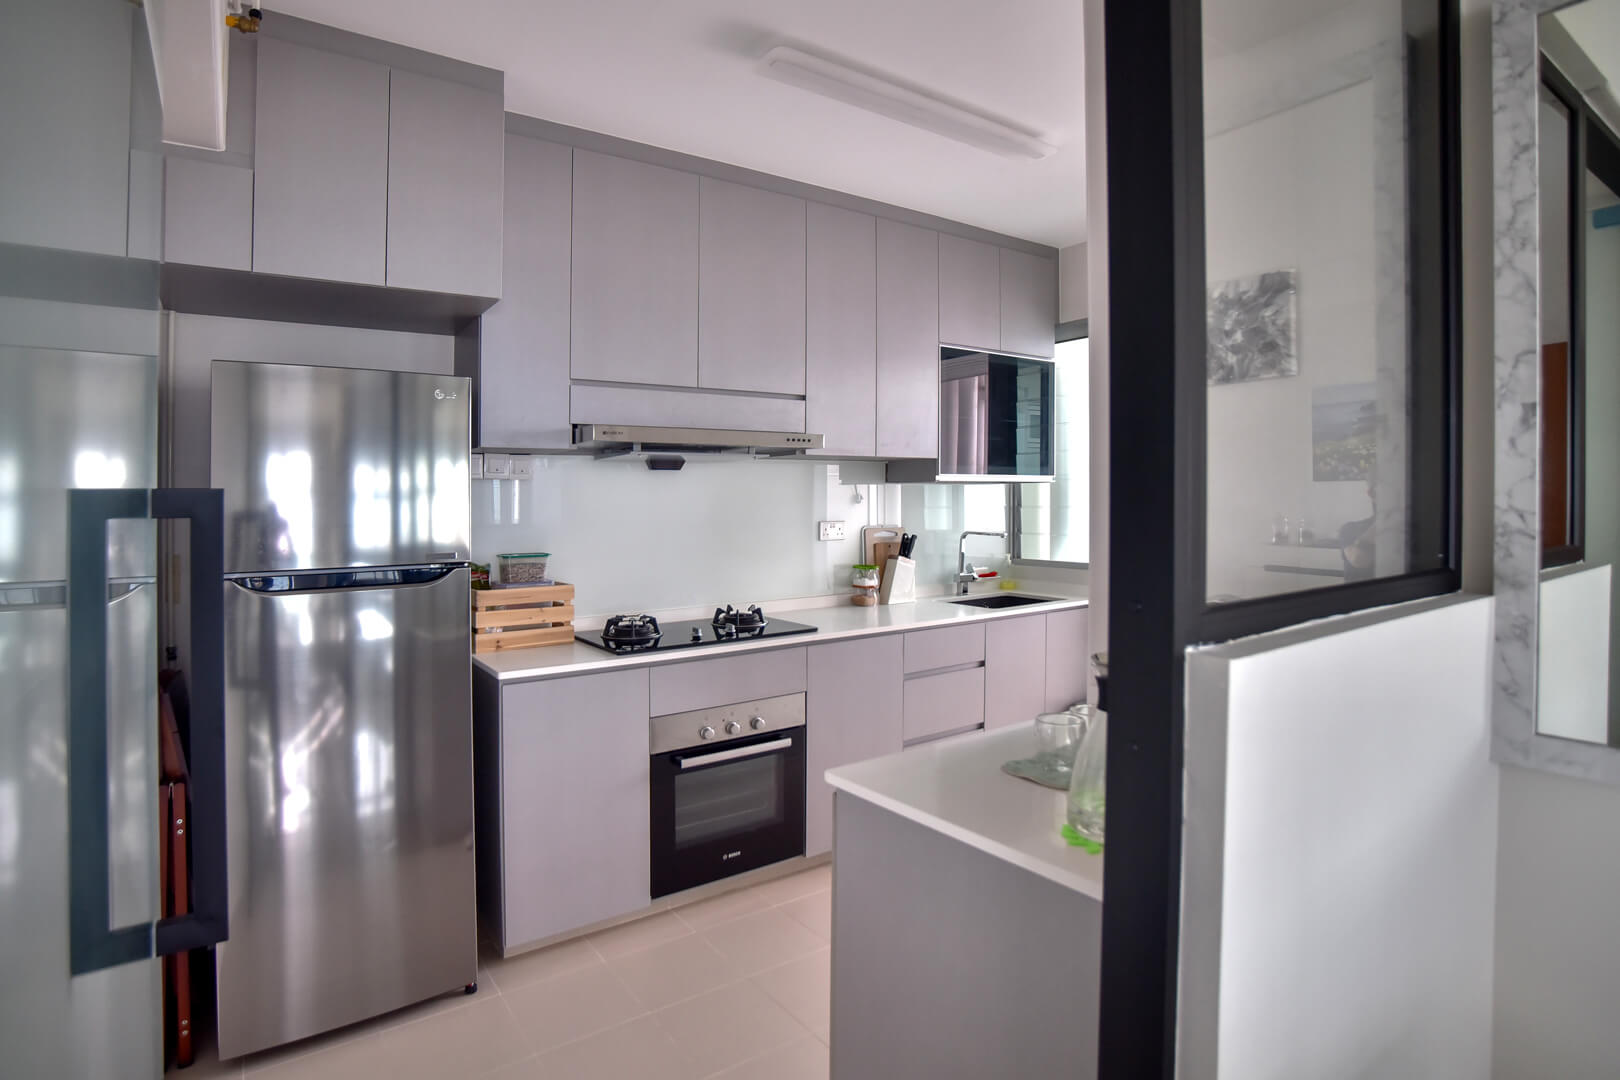 white-monochrome-interior-design-kitchen-side